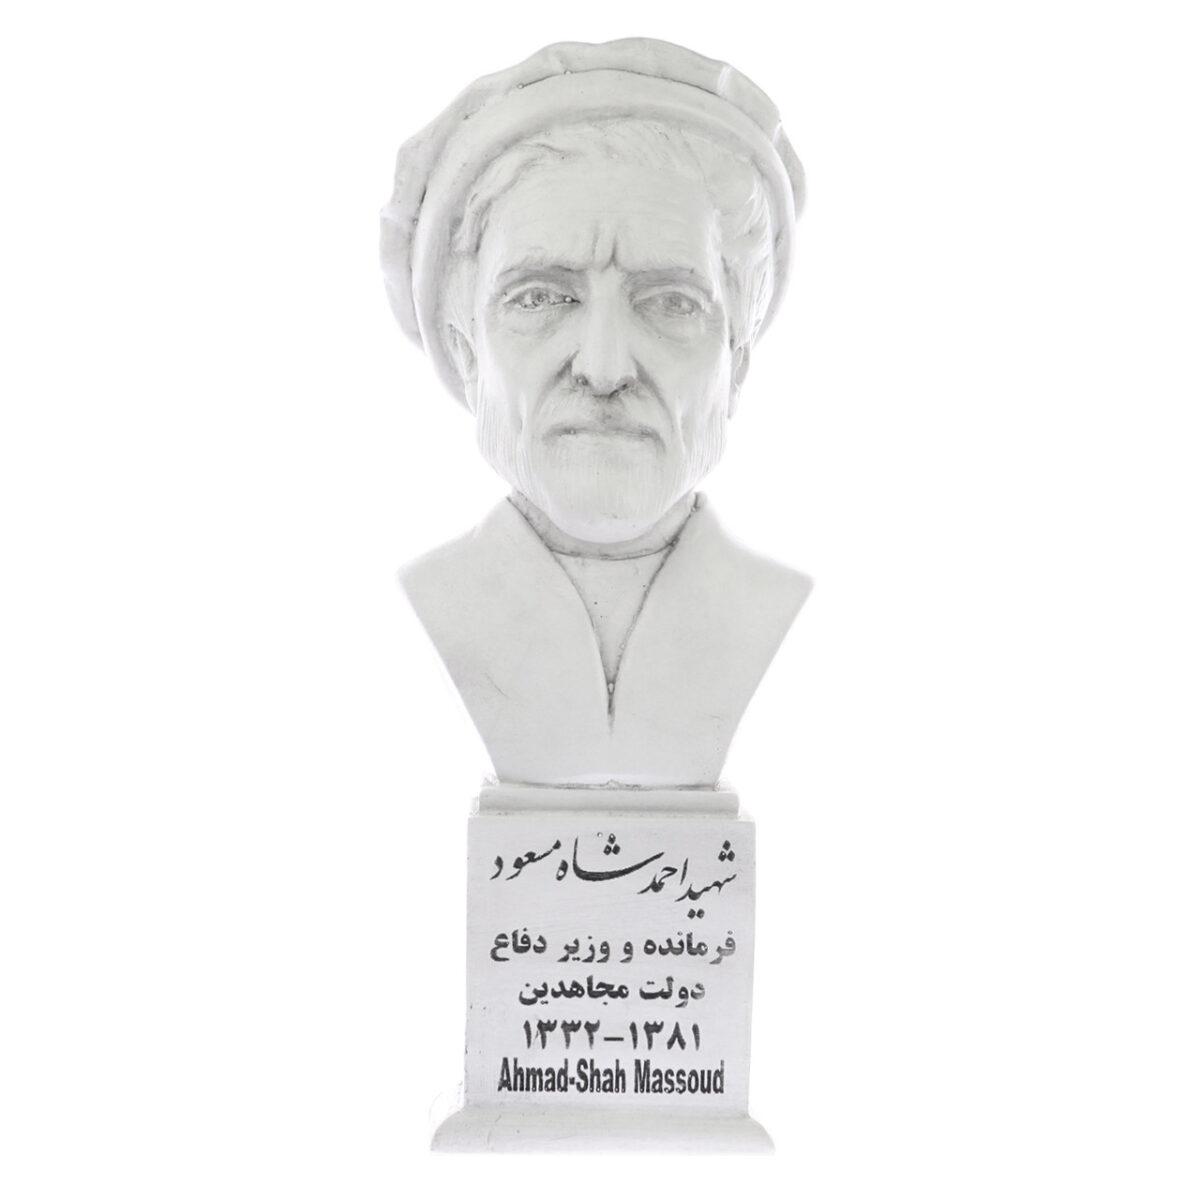 ahmad shah masoud s 1200x1200 - سردیس احمد شاه مسعود